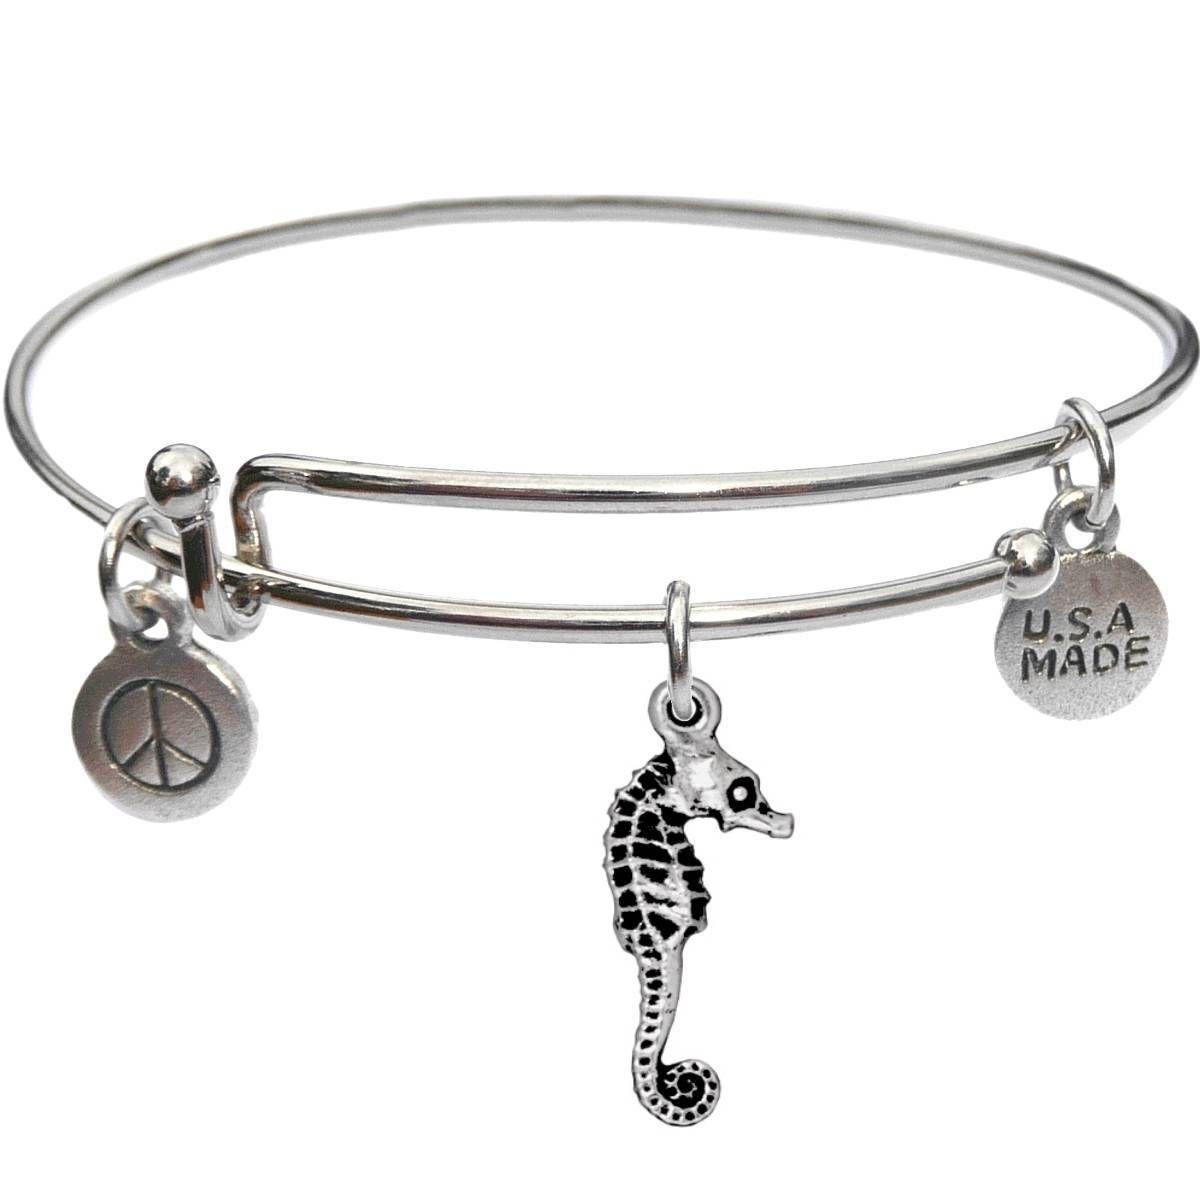 Bangle Bracelet and Seahorse - USA Made - BBandJT167